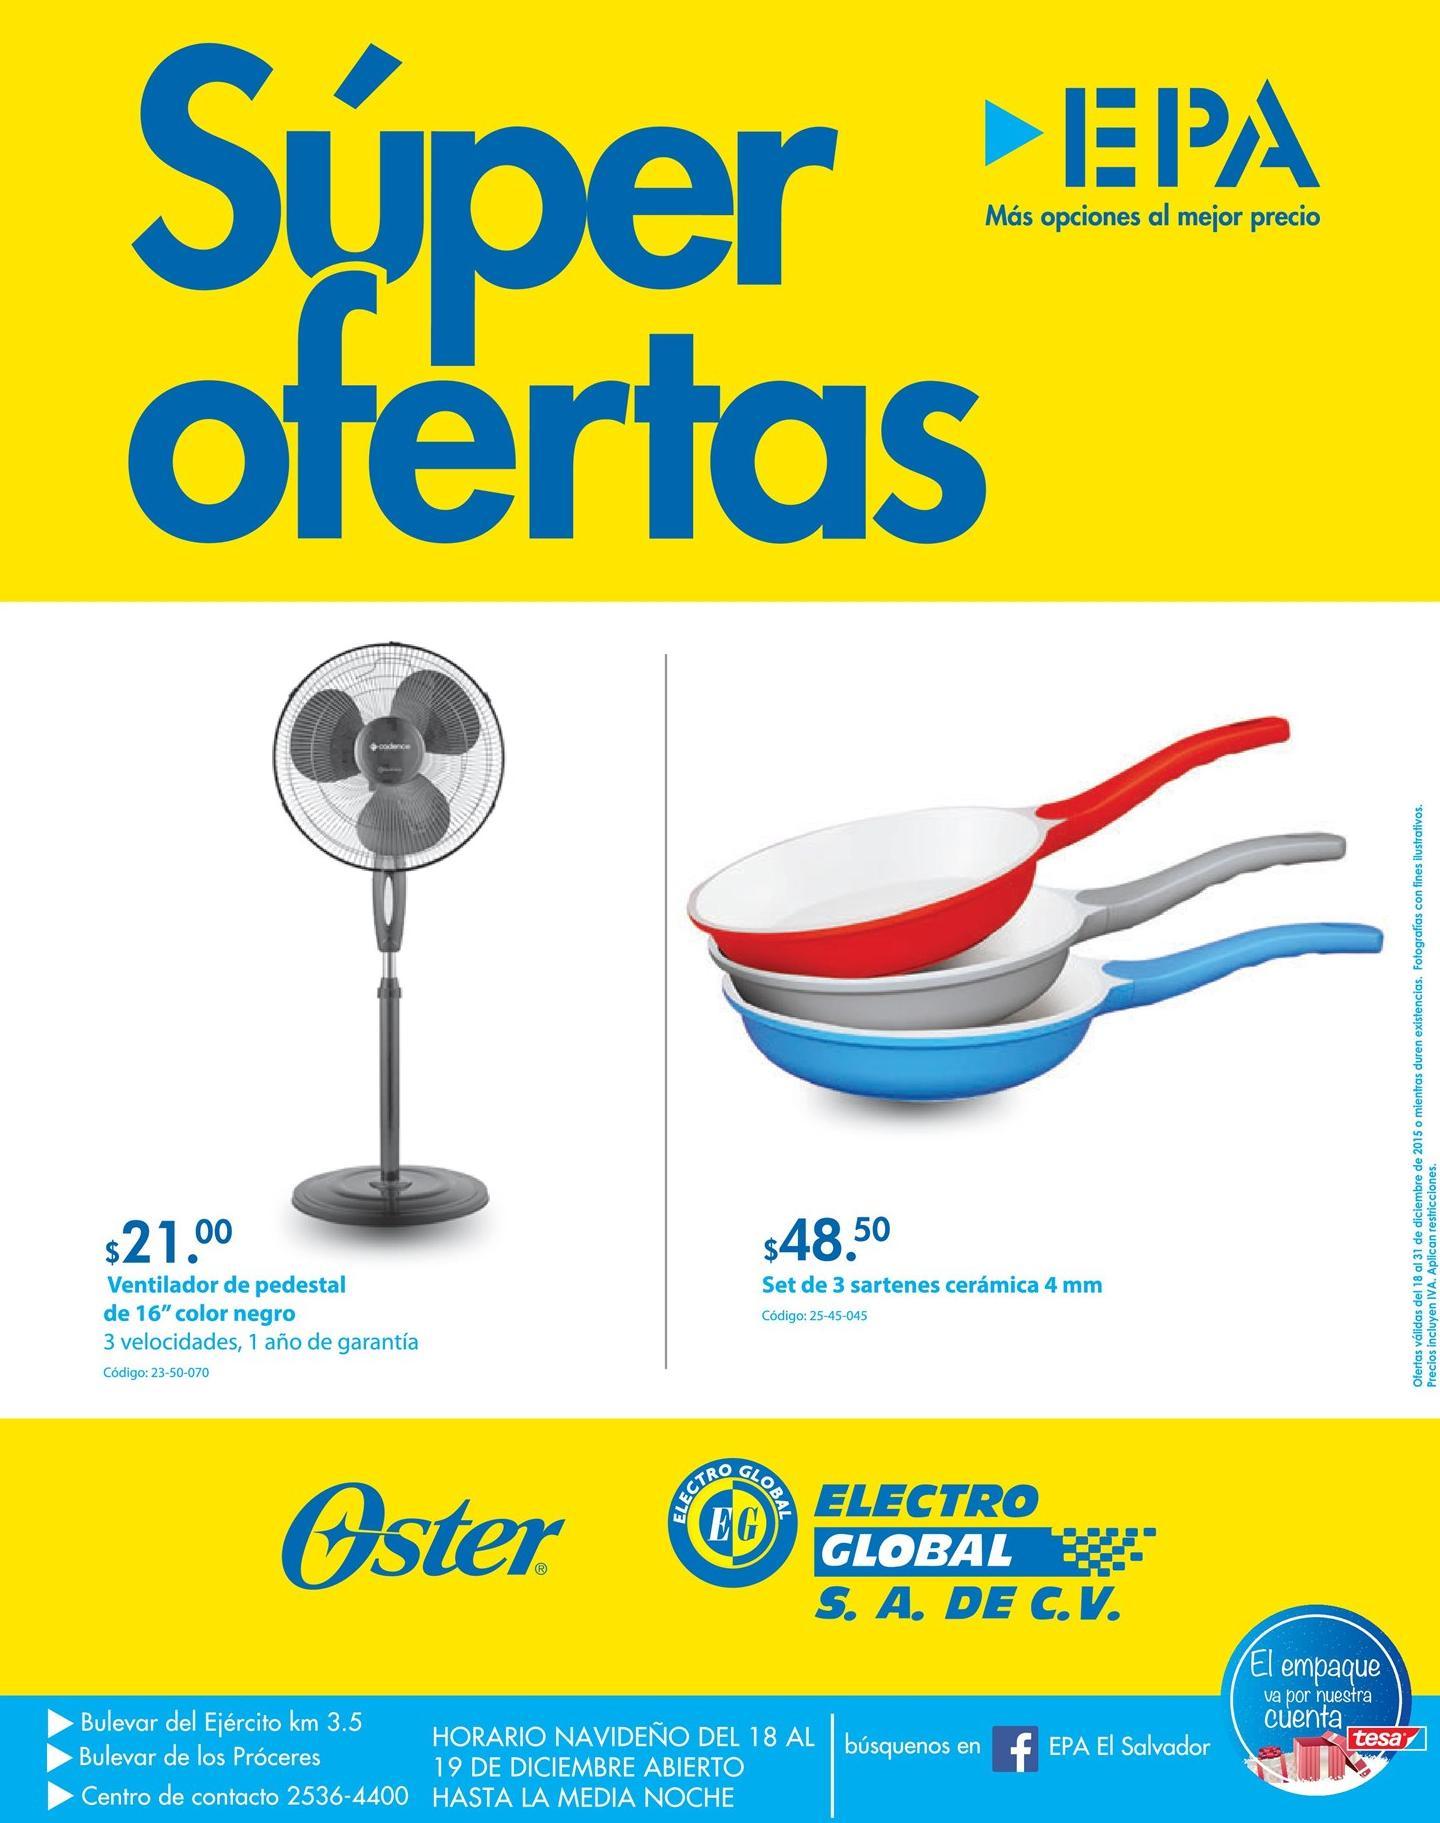 EPA super ofertas en OSTER electro products holiday deals